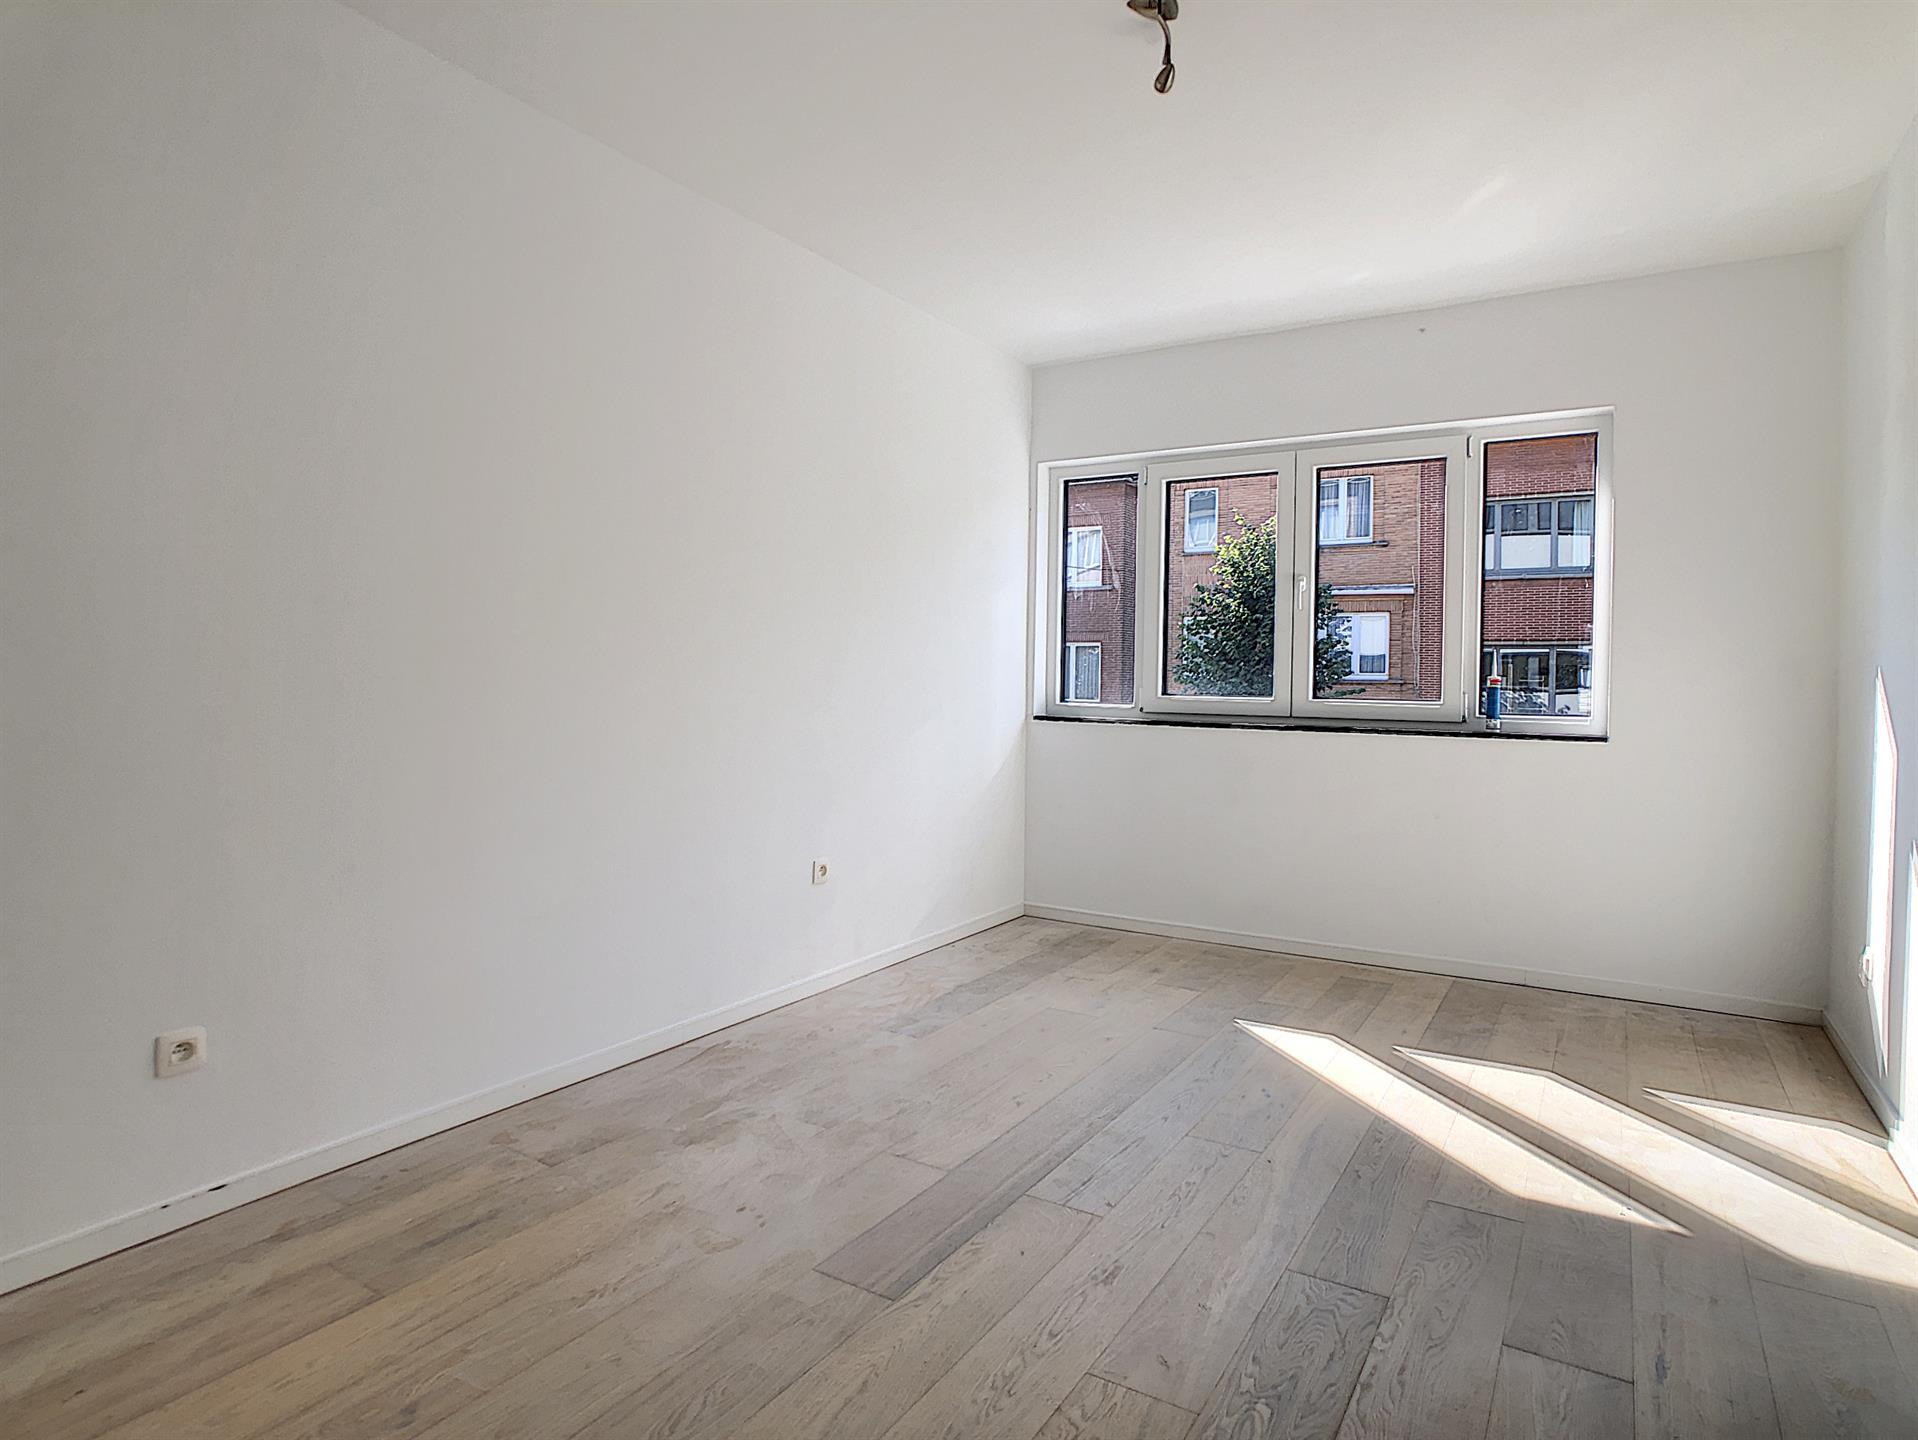 Appartement - Anderlecht - #4252388-8